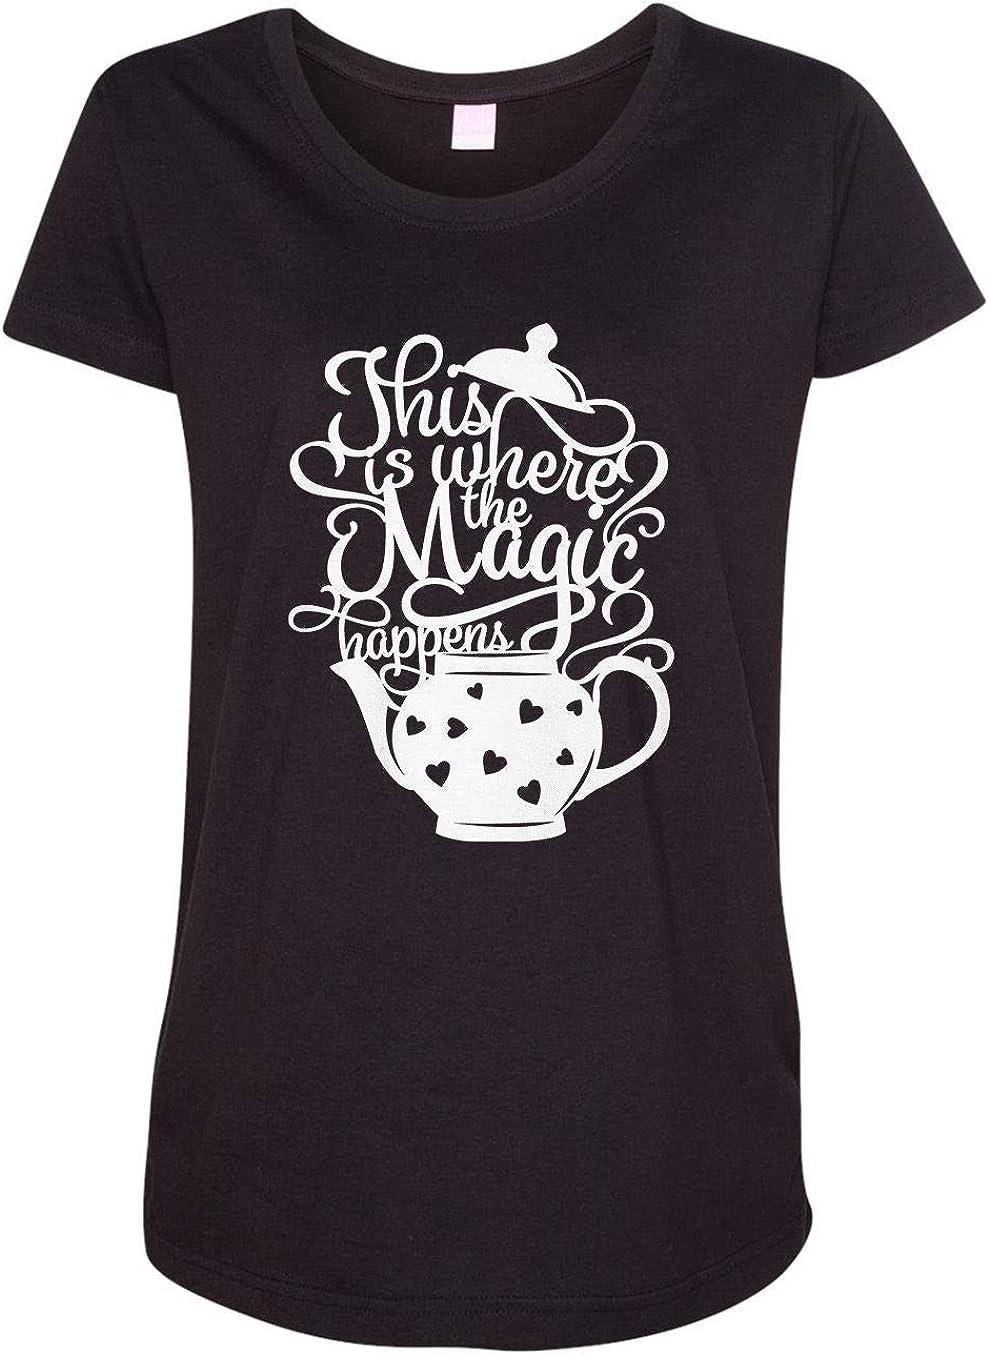 HARD EDGE DESIGN Women's Tea This is Where The Magic Happens T-Shirt